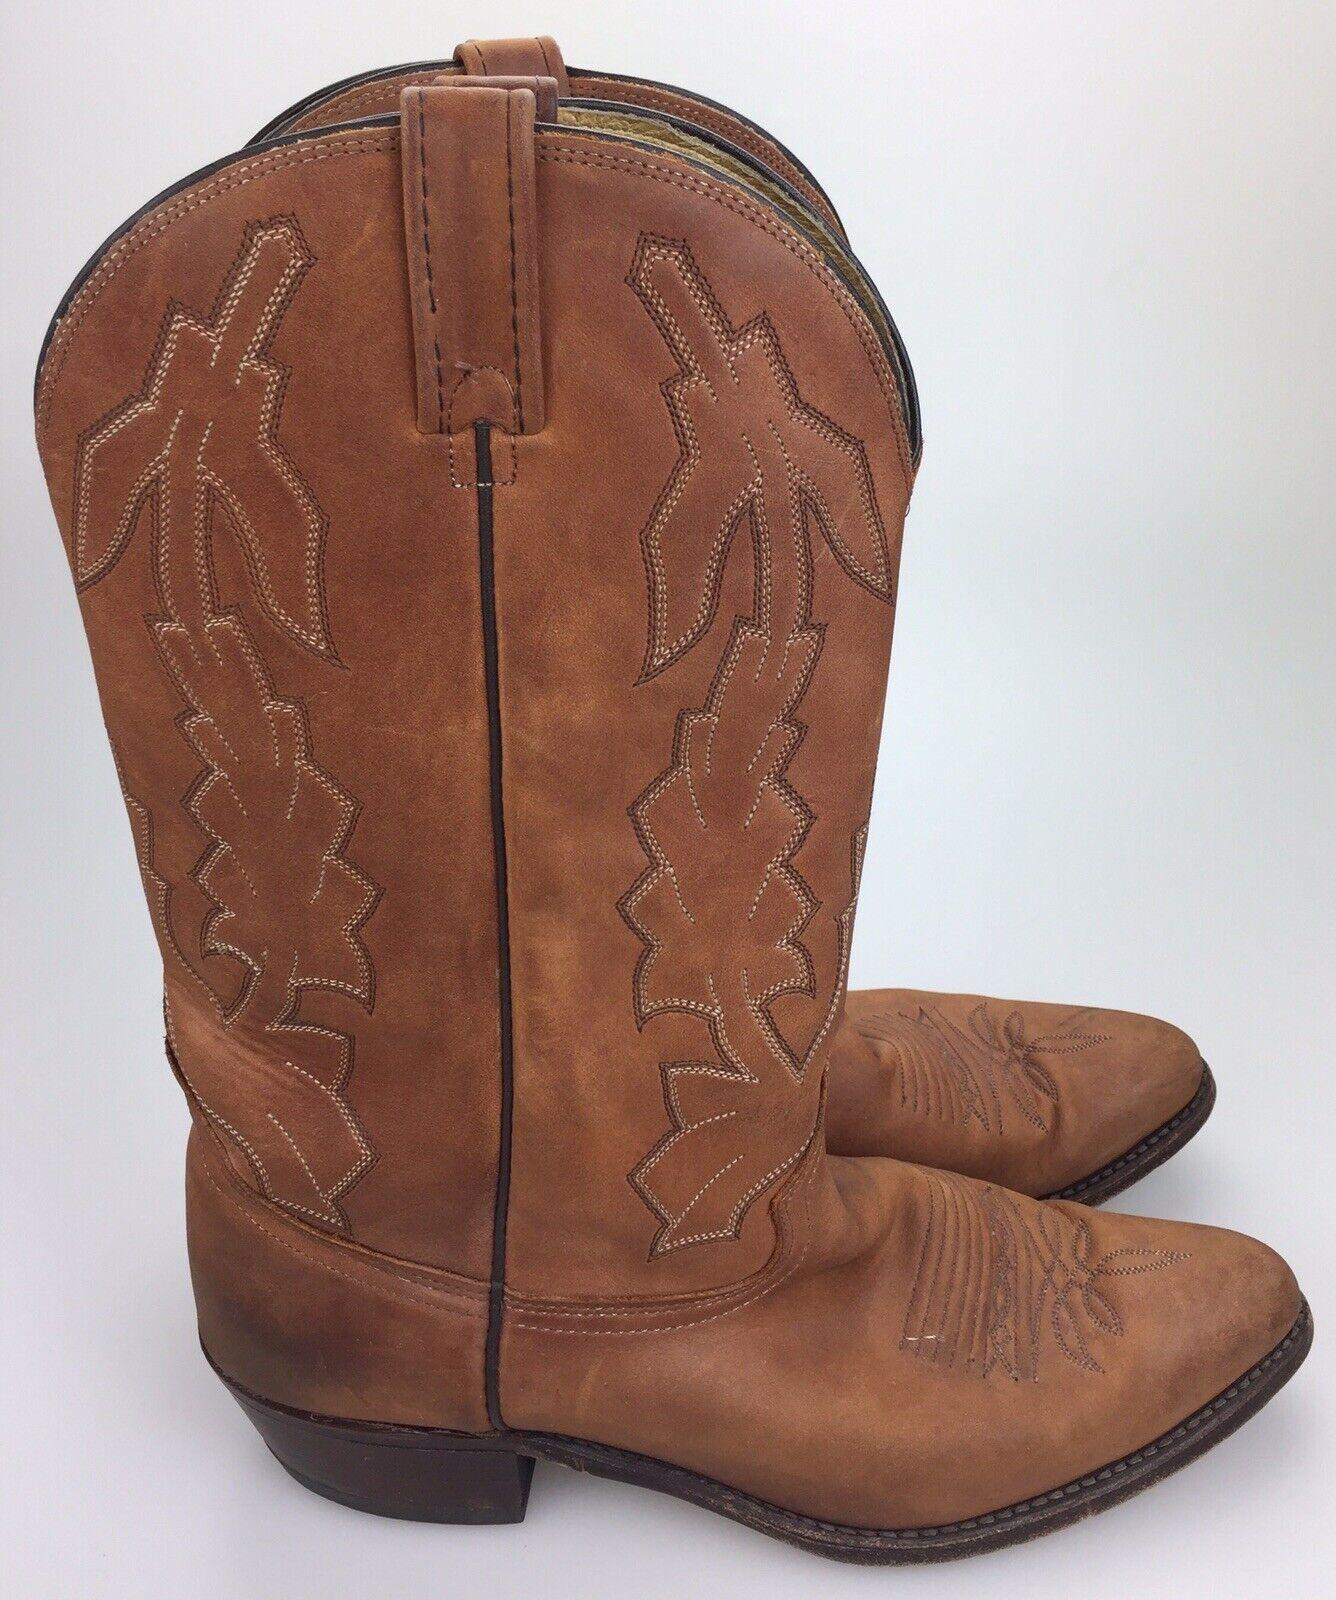 RARE Dan Post Men's 'Marlbgold' Brown Leather Cowboy Boots USA Style P2551 Sz 12D